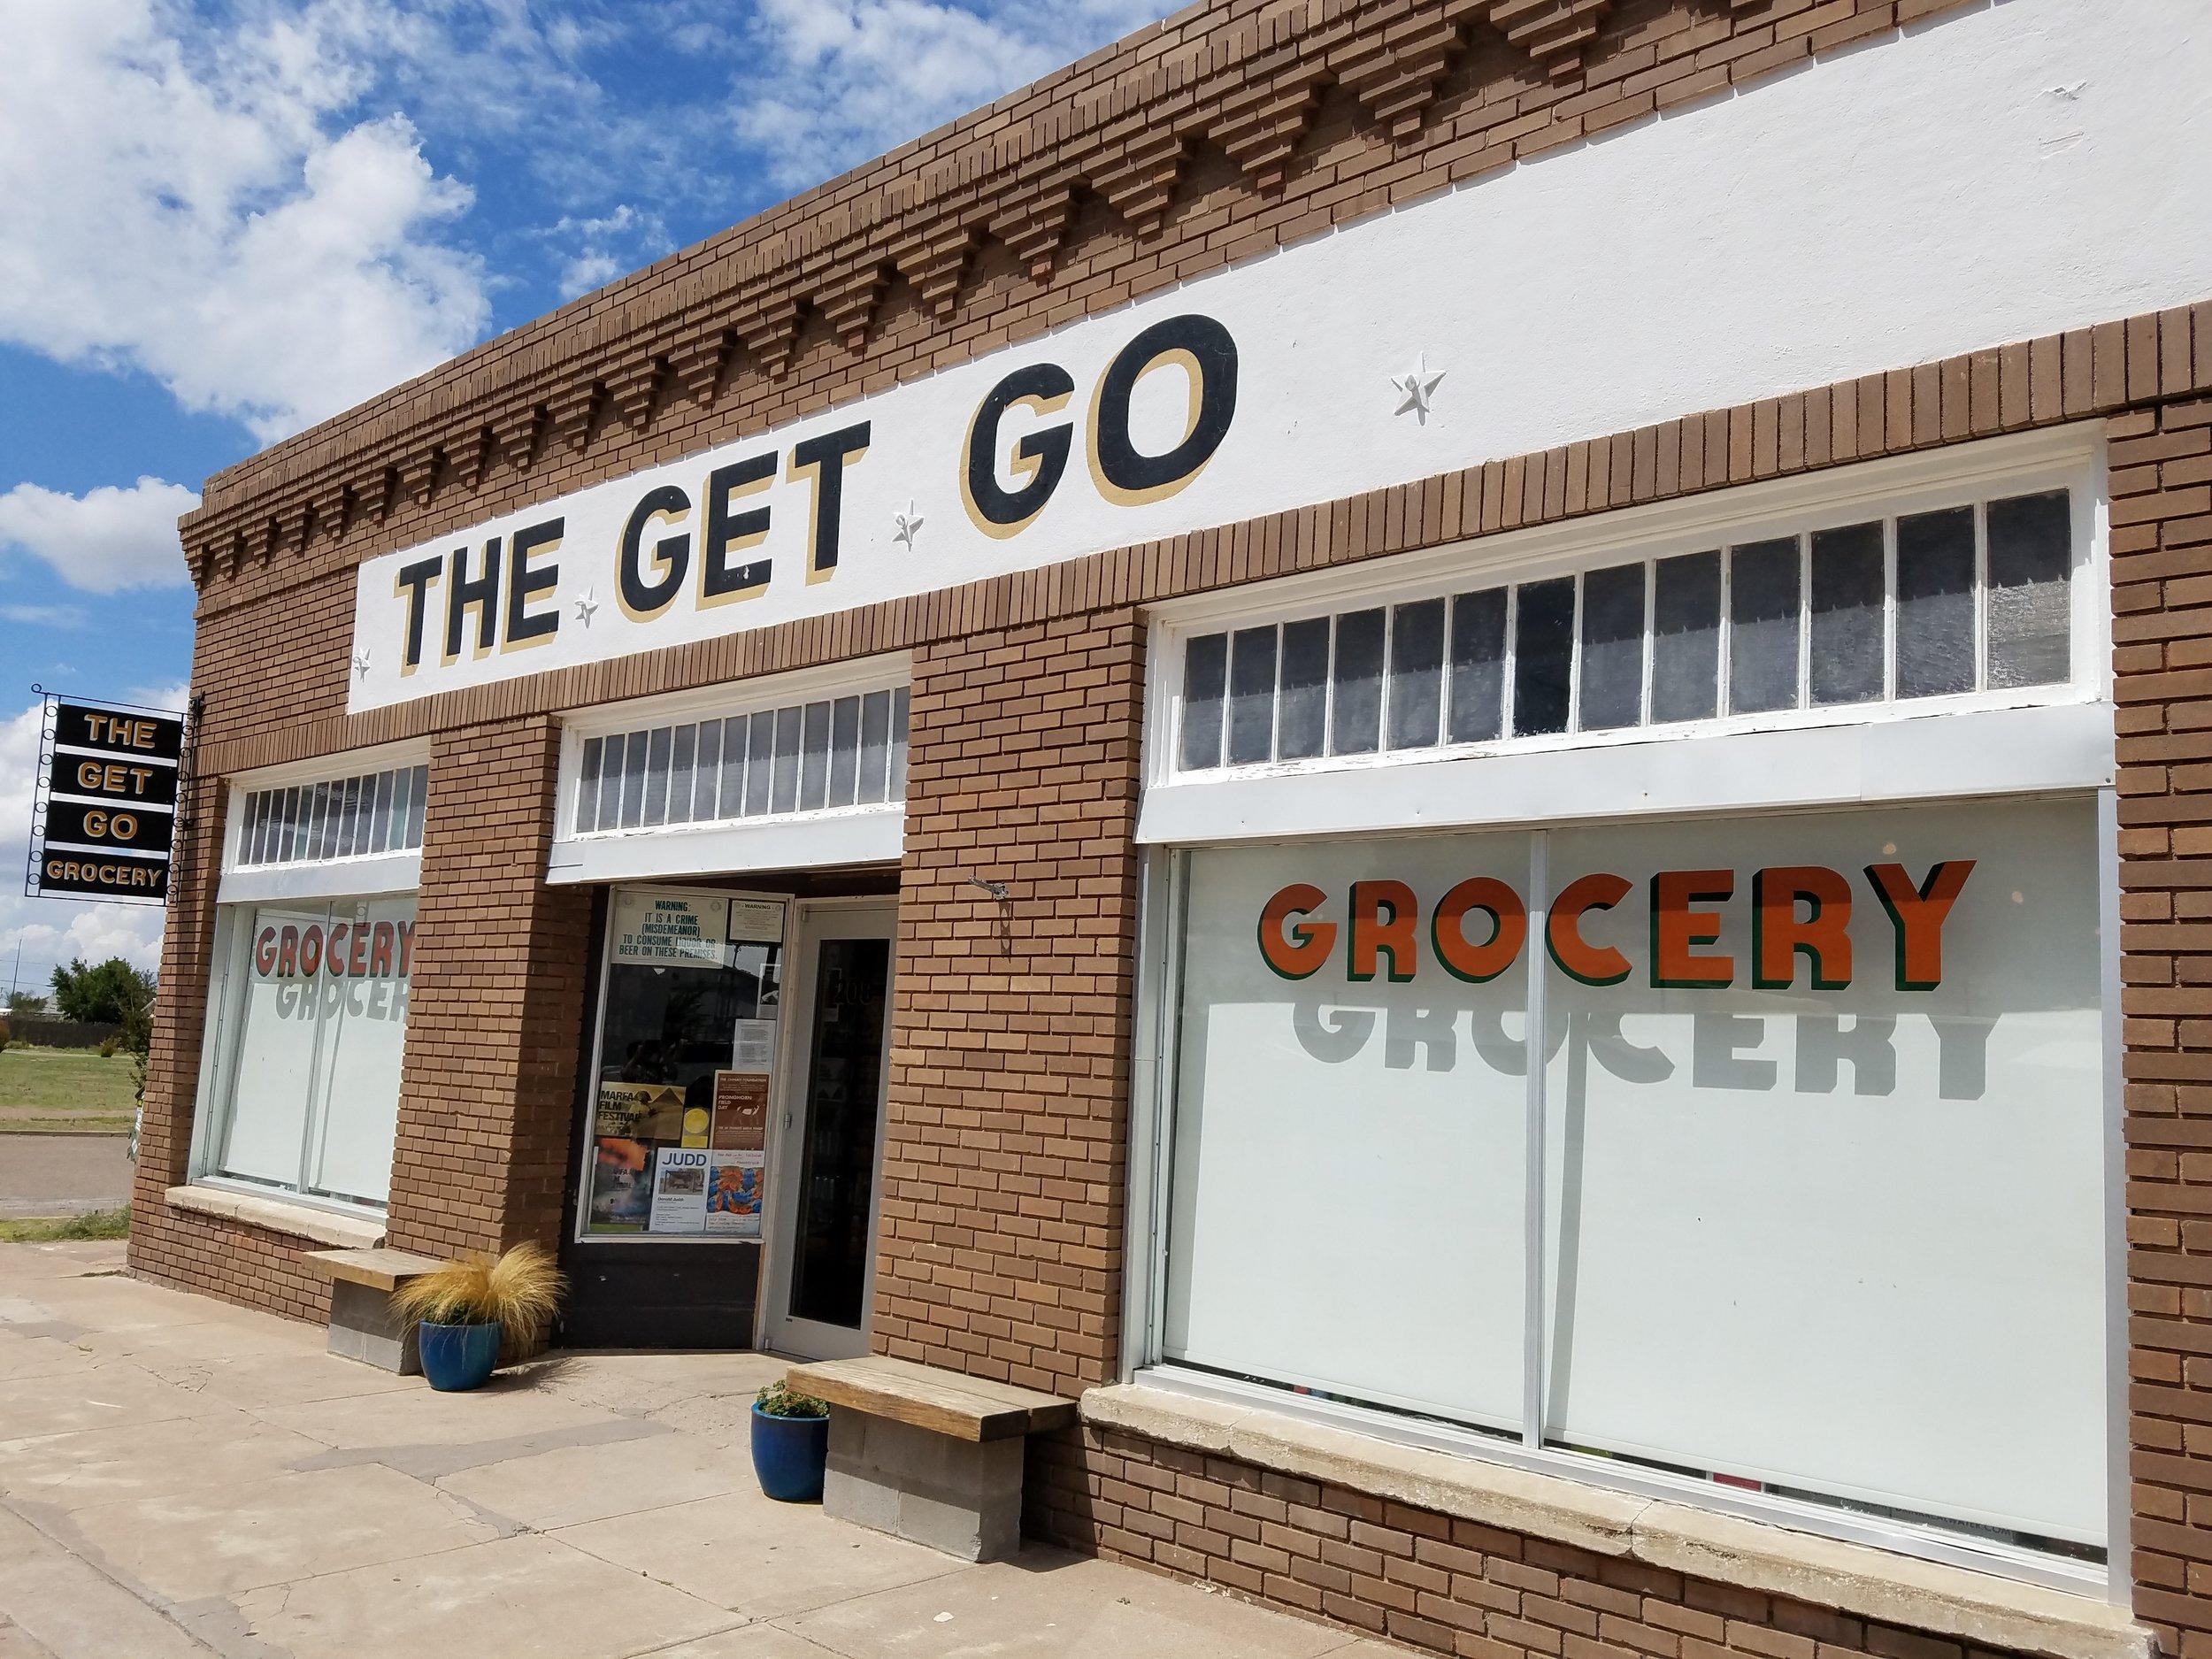 Marfa, Texas grocery.